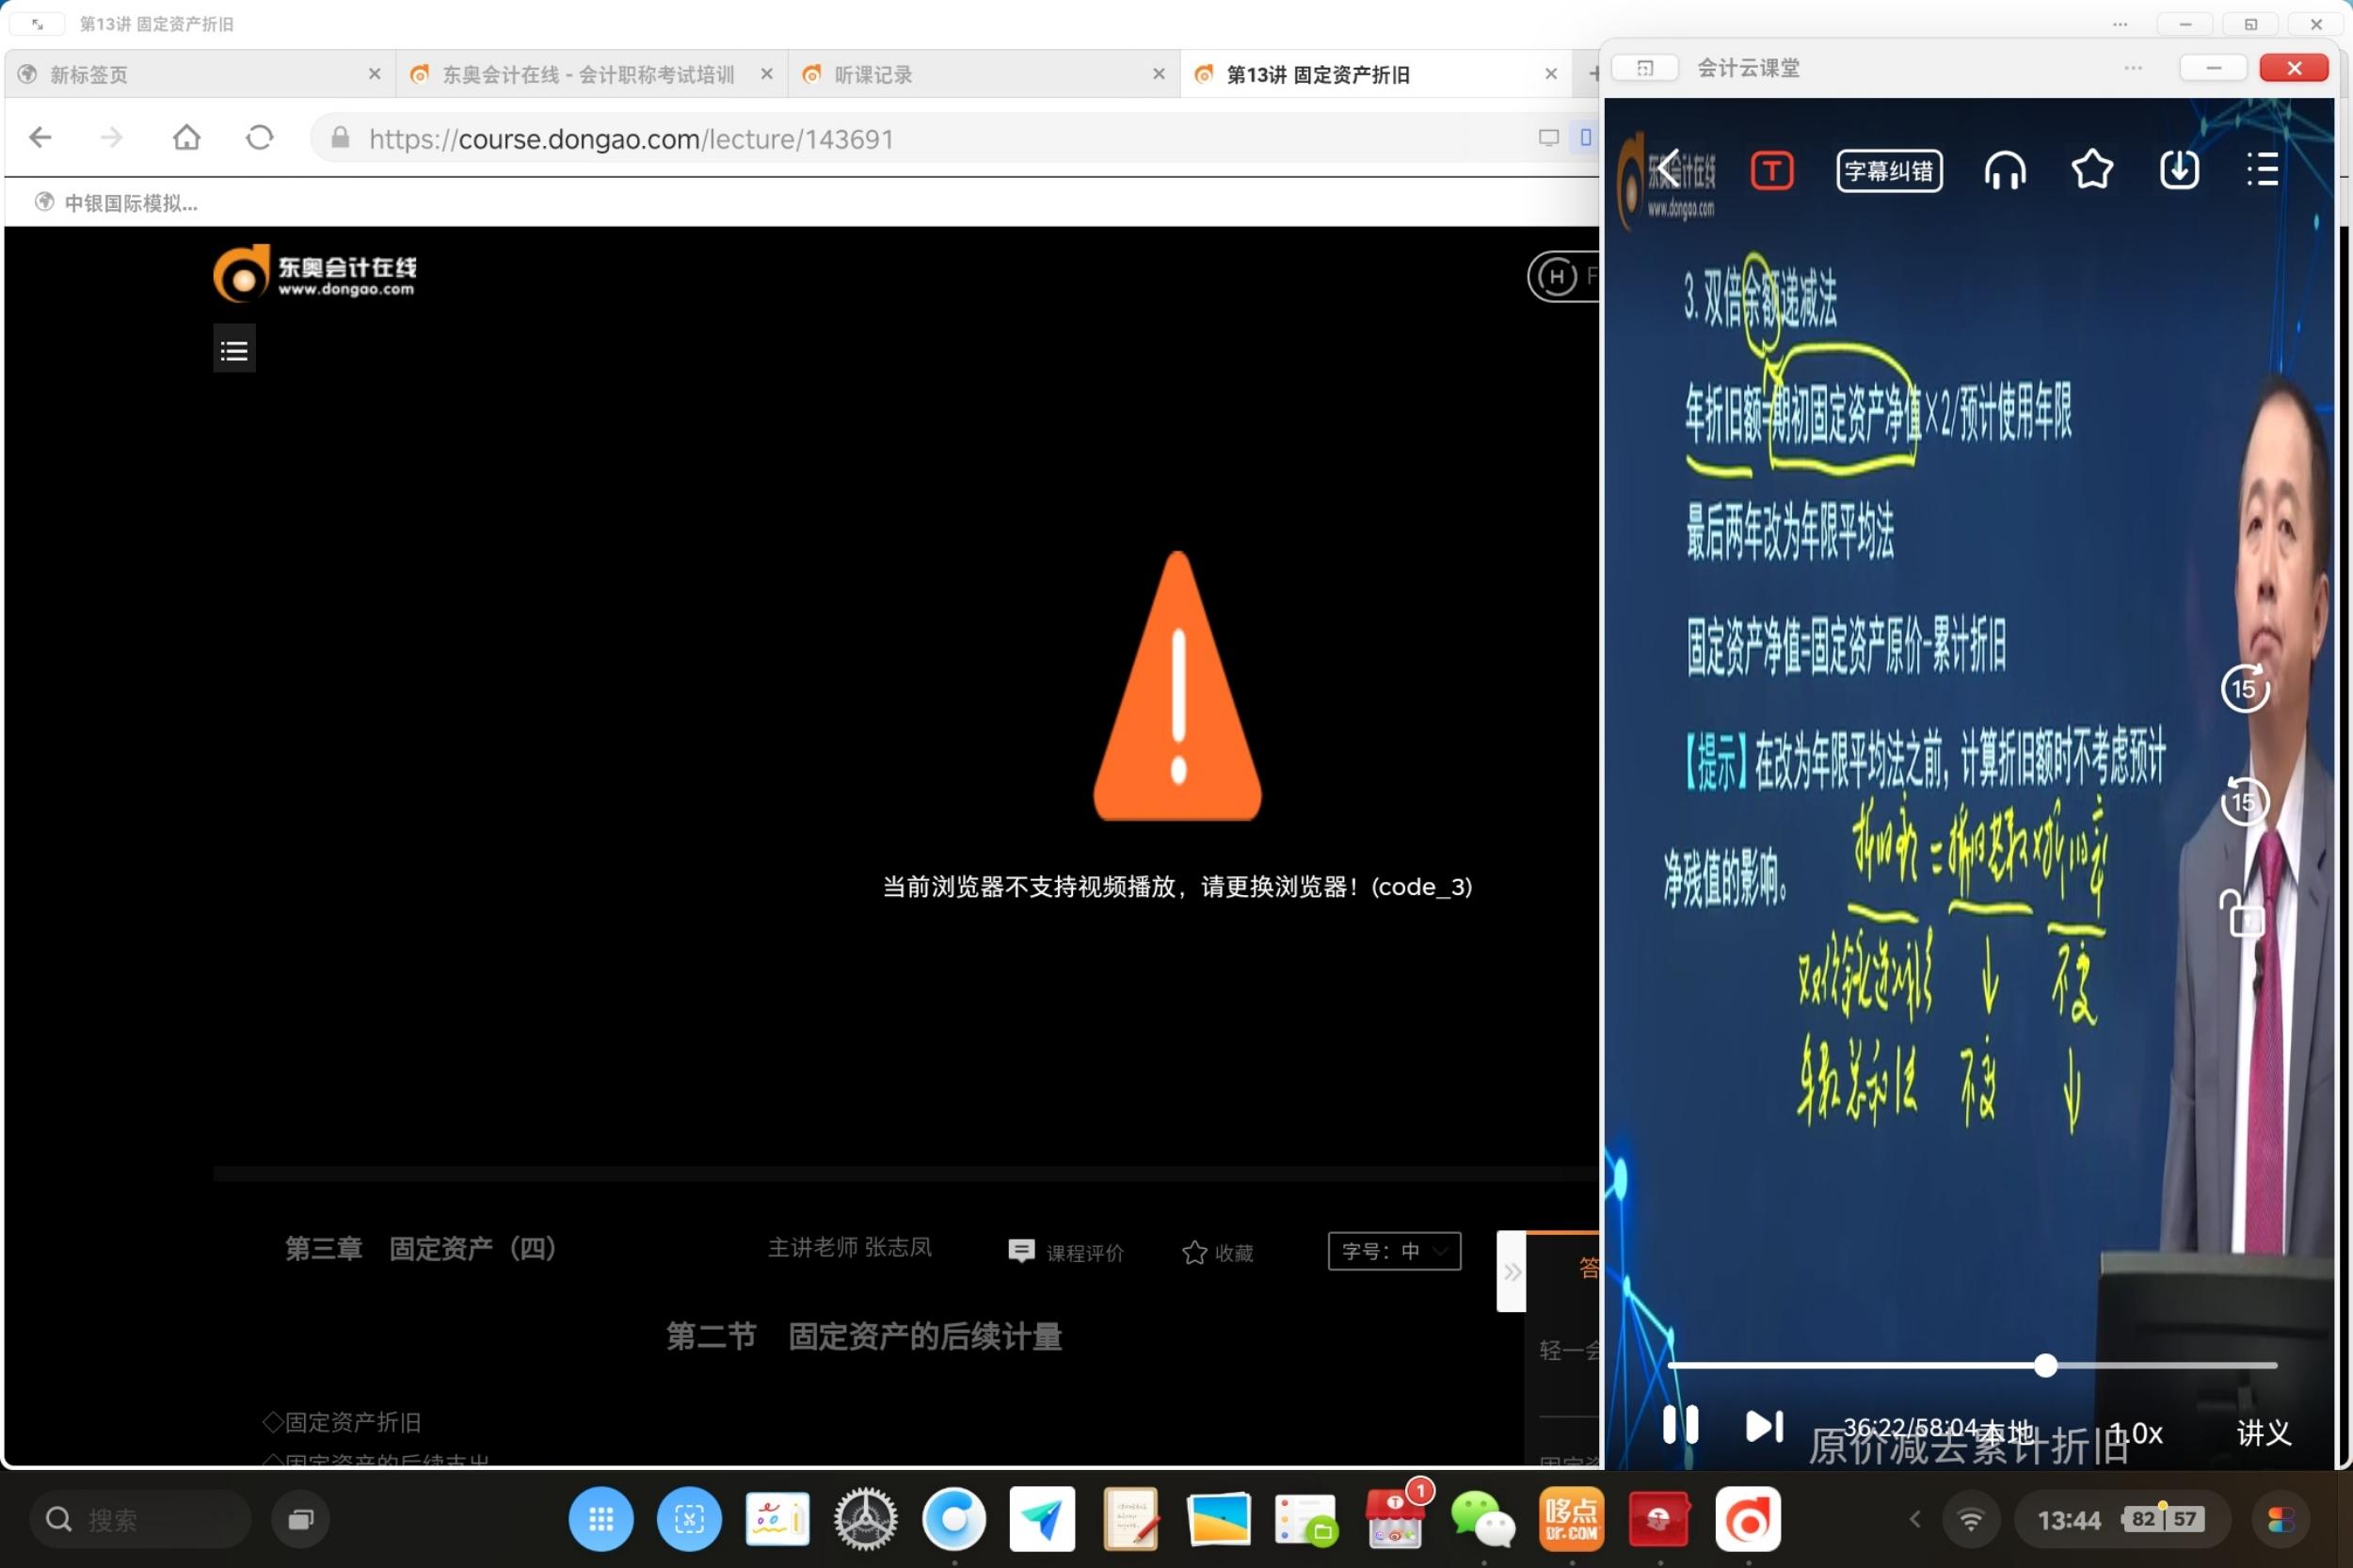 Screenshot_2021-05-11-13-44-00-644_fullscreen.jpg